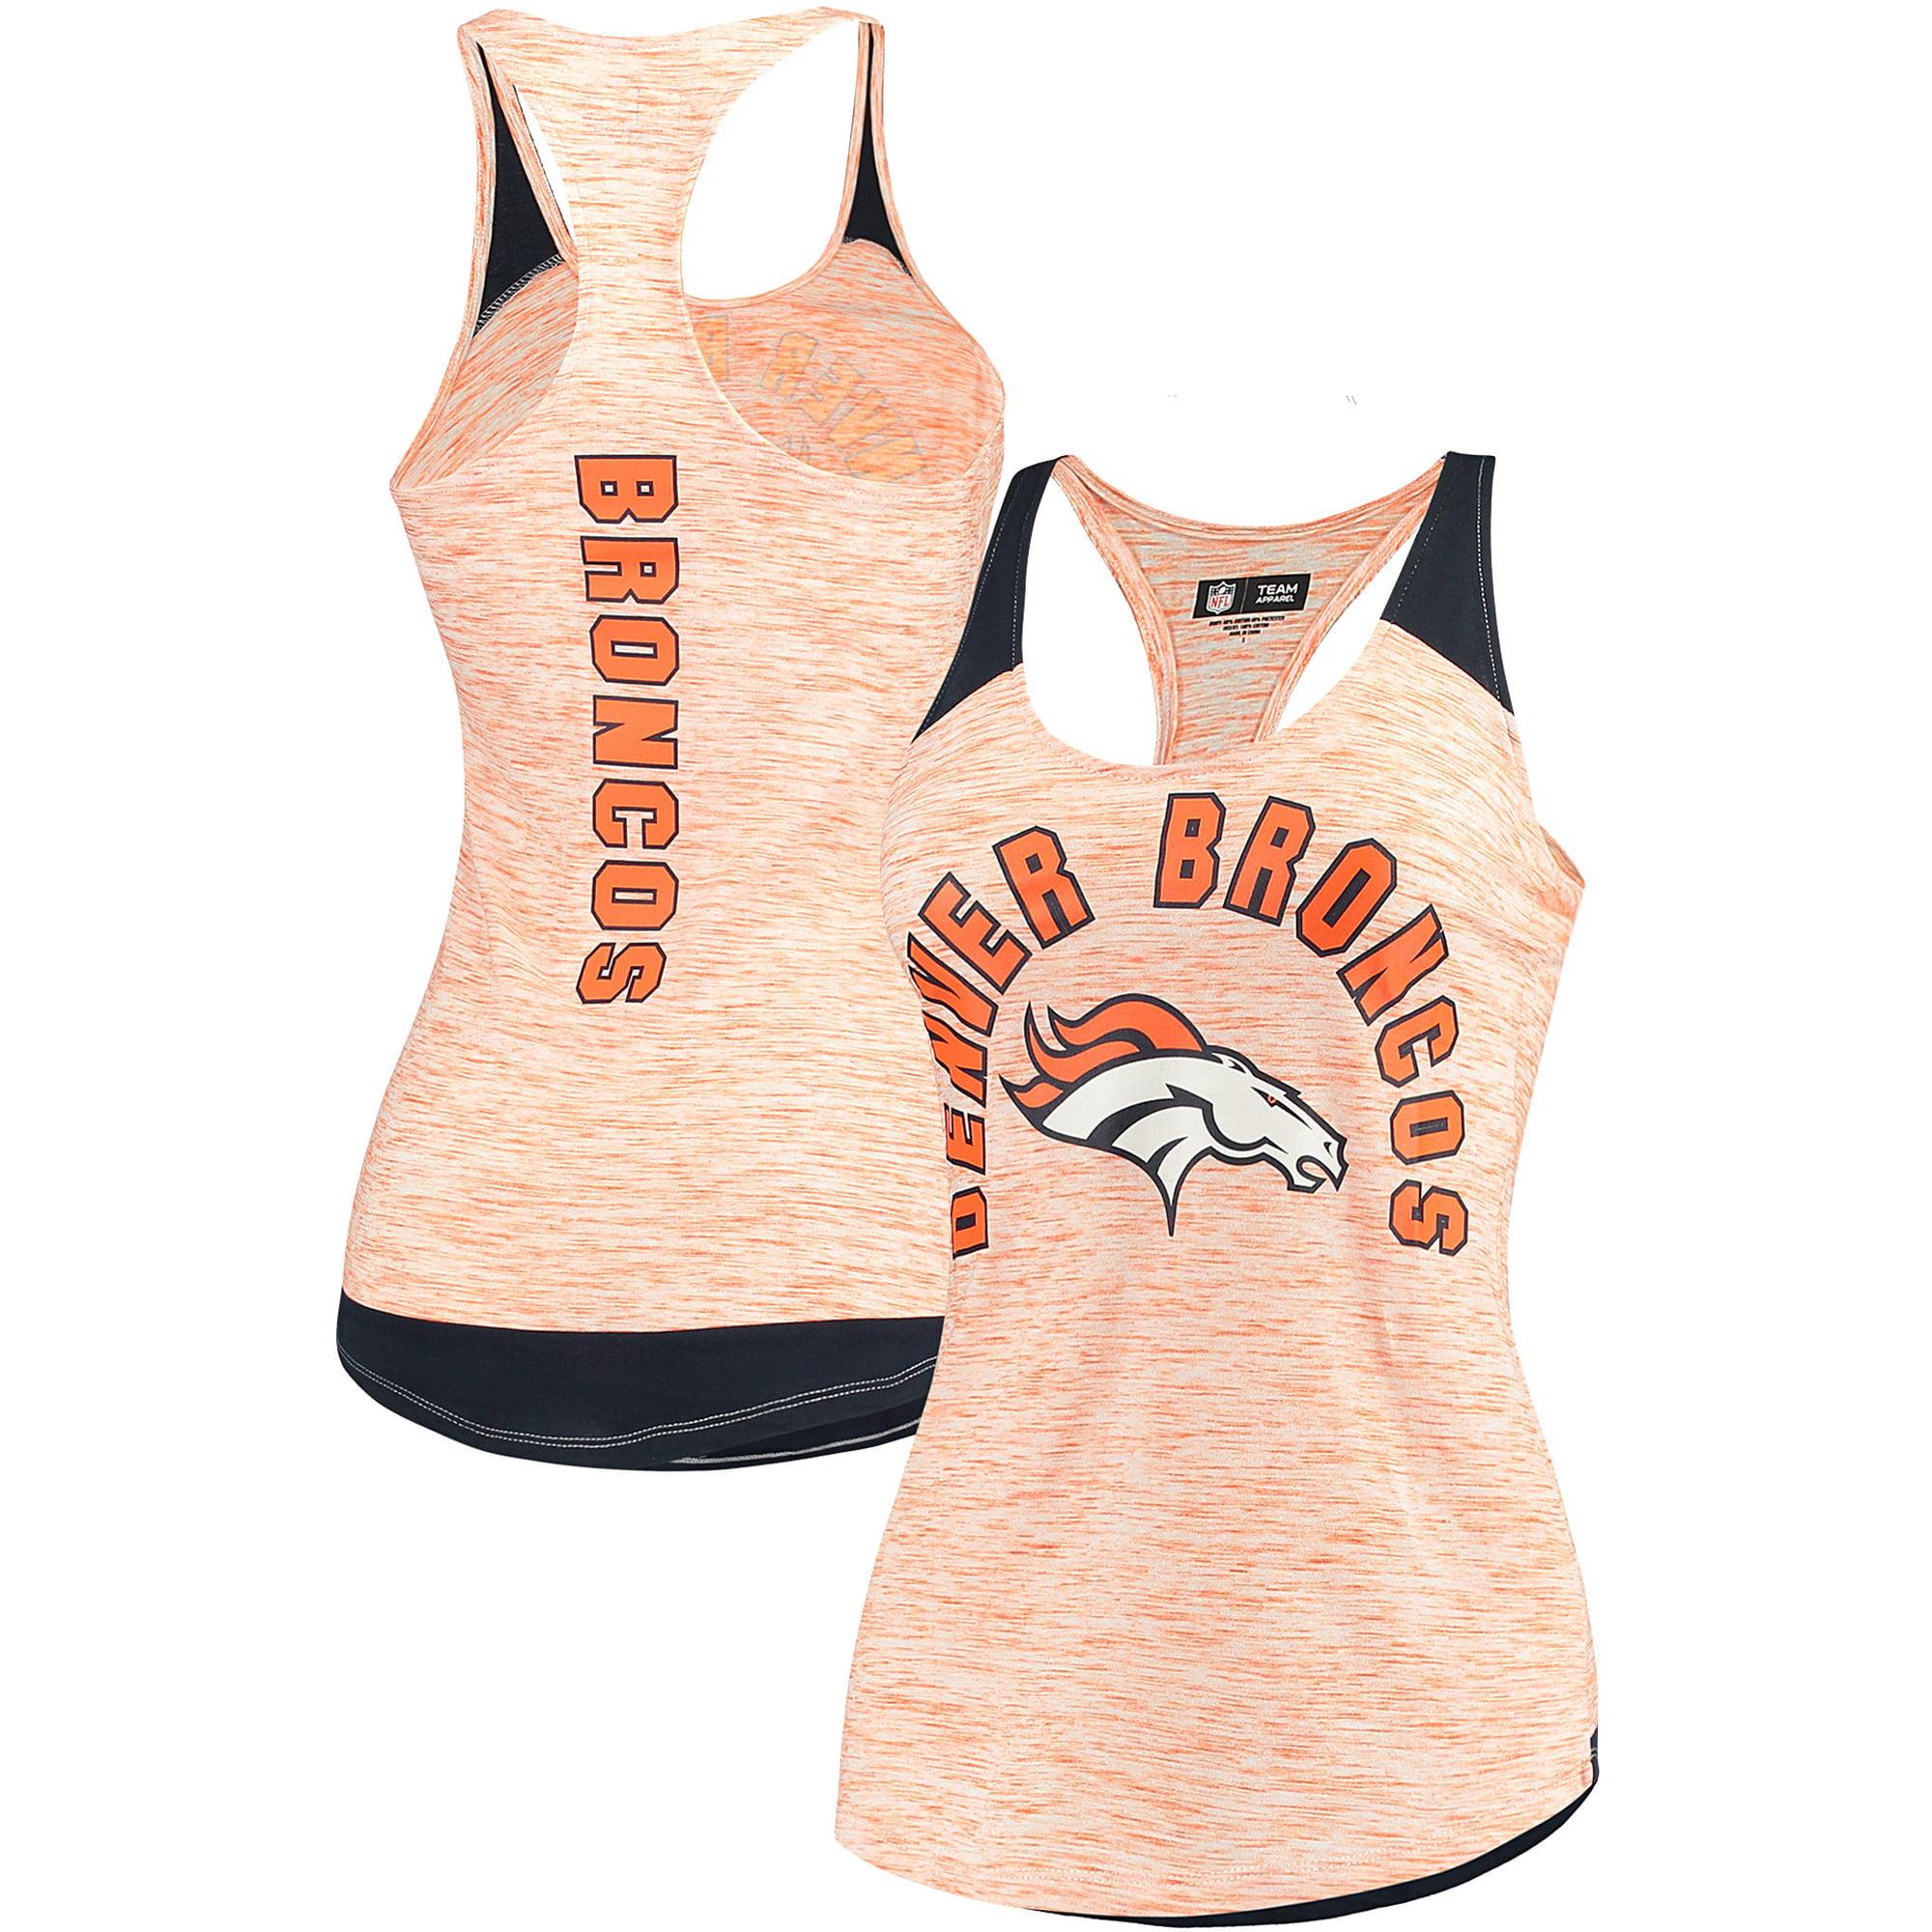 Denver Broncos 5th & Ocean by New Era Women's Space Dye Racerback Tank Top - Heathered Orange/Navy